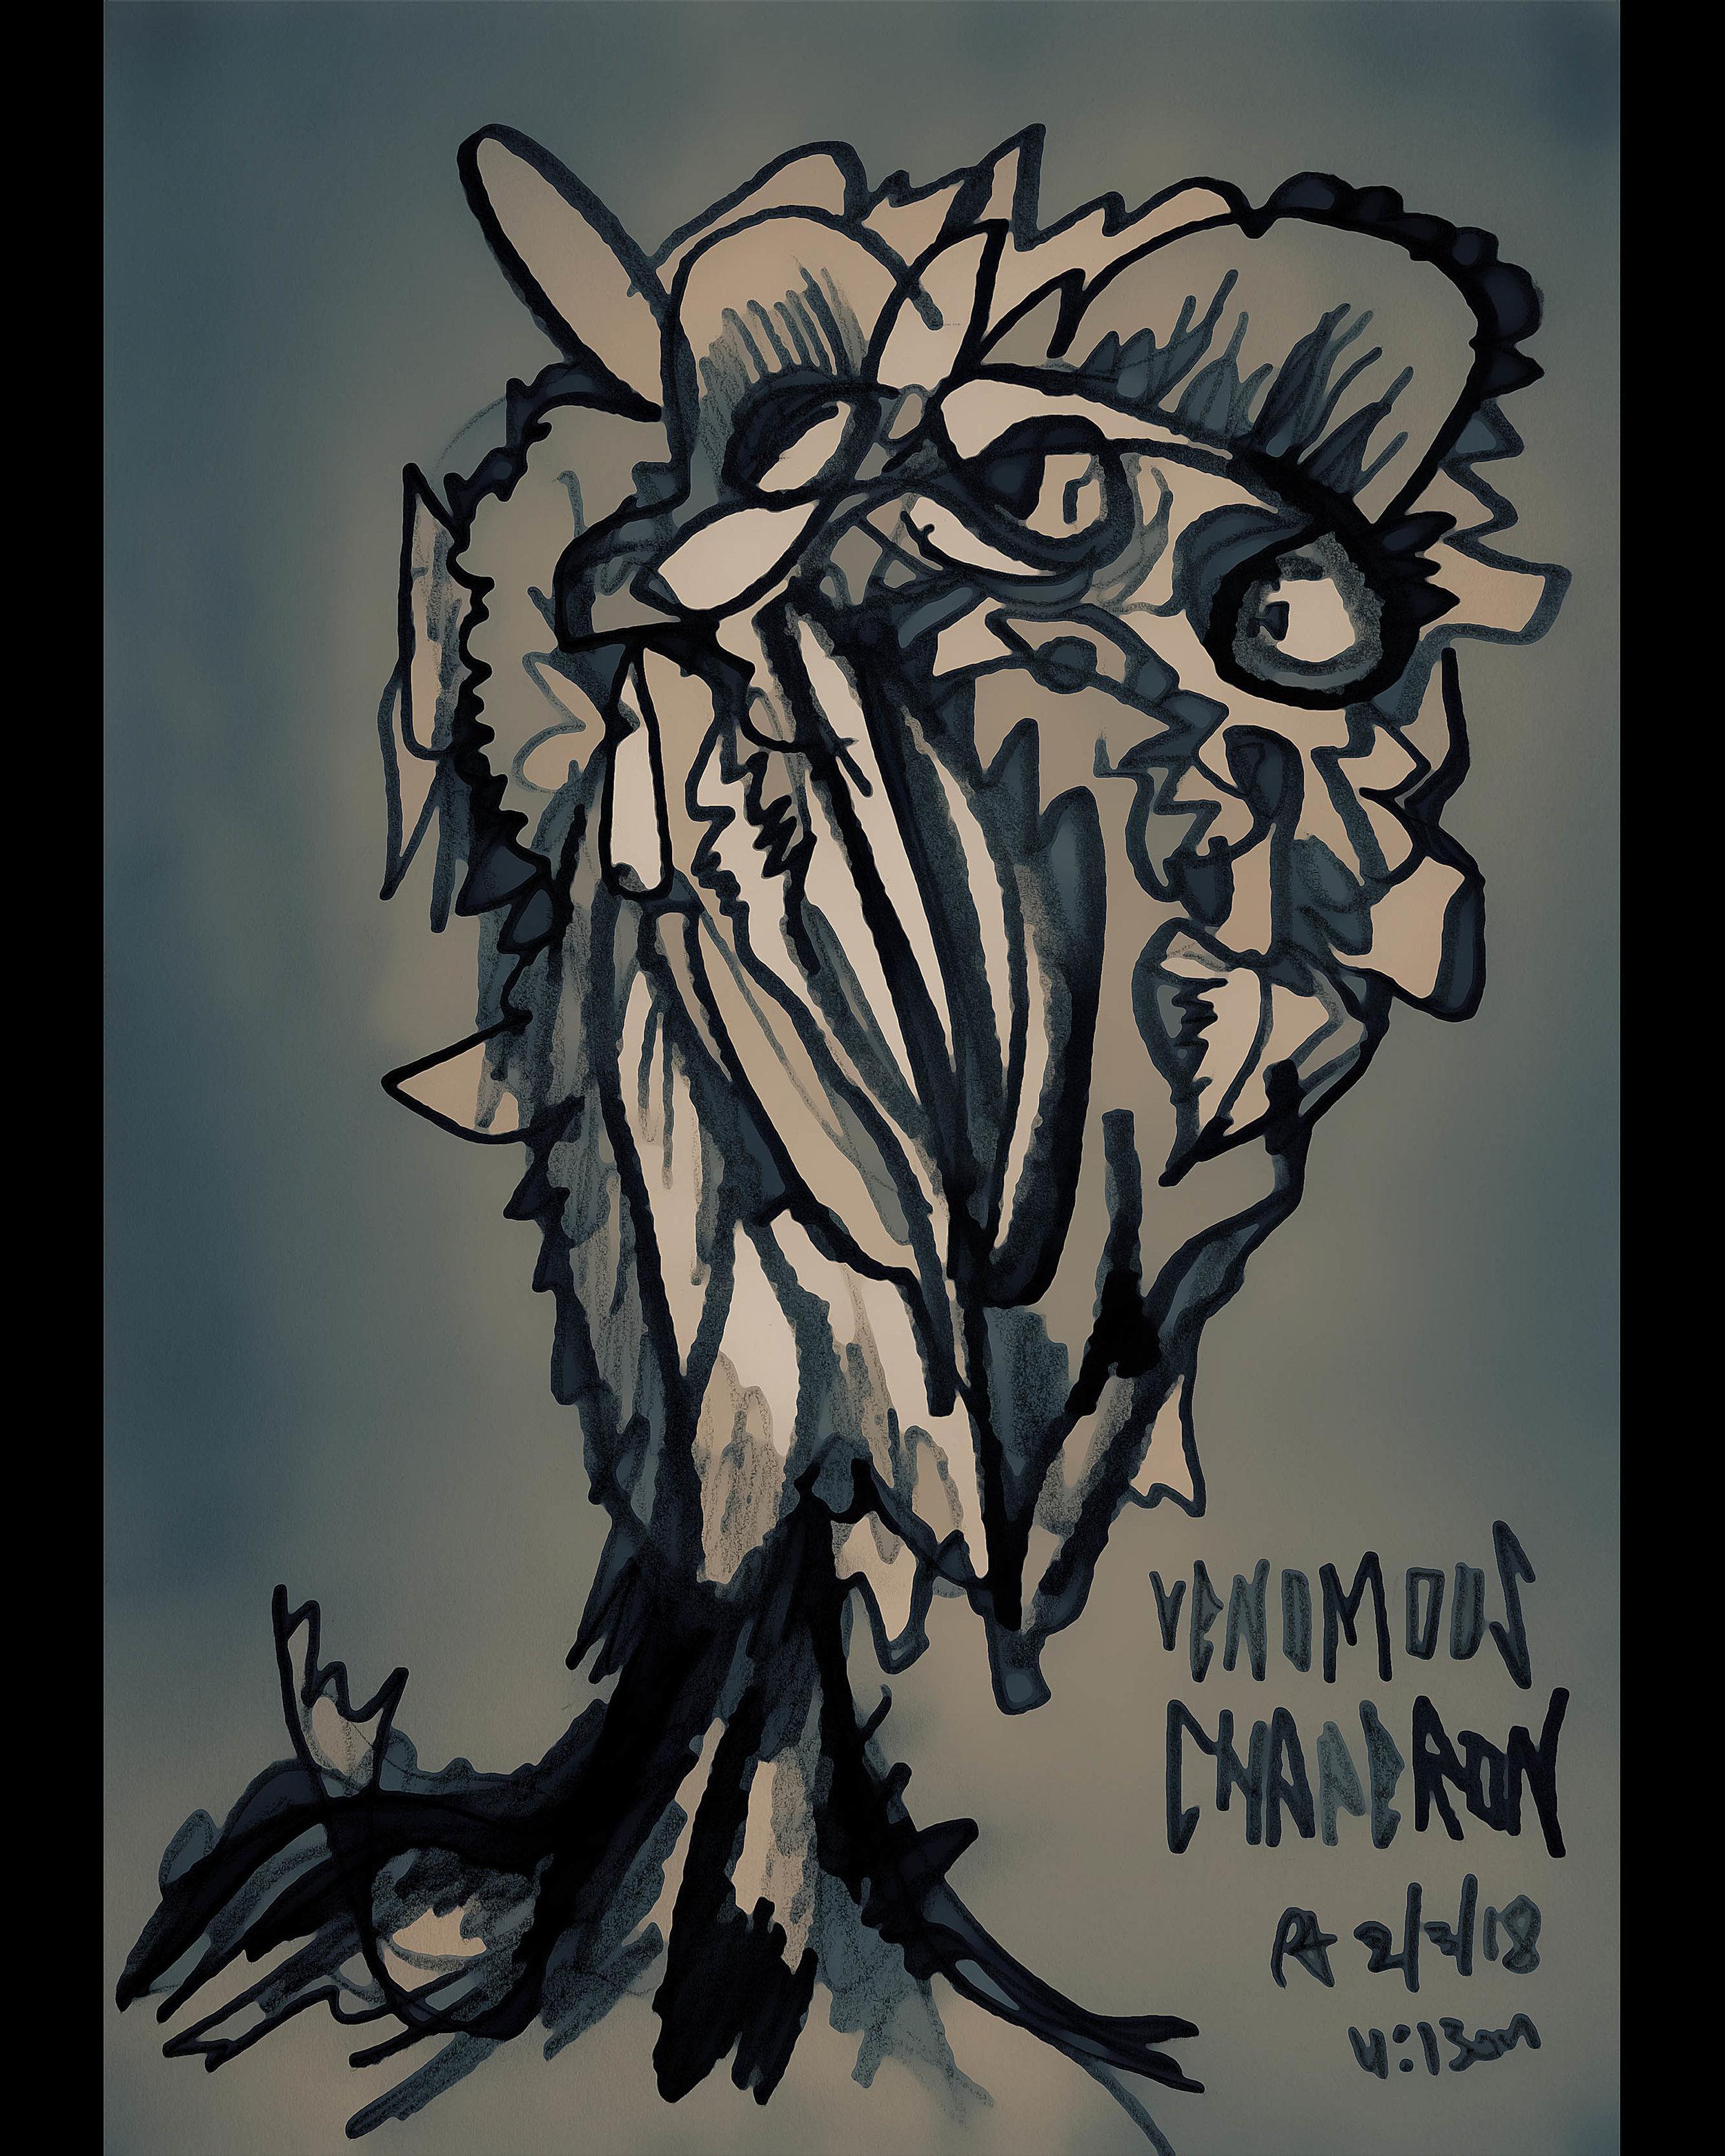 VENOMOUS CHAPERON